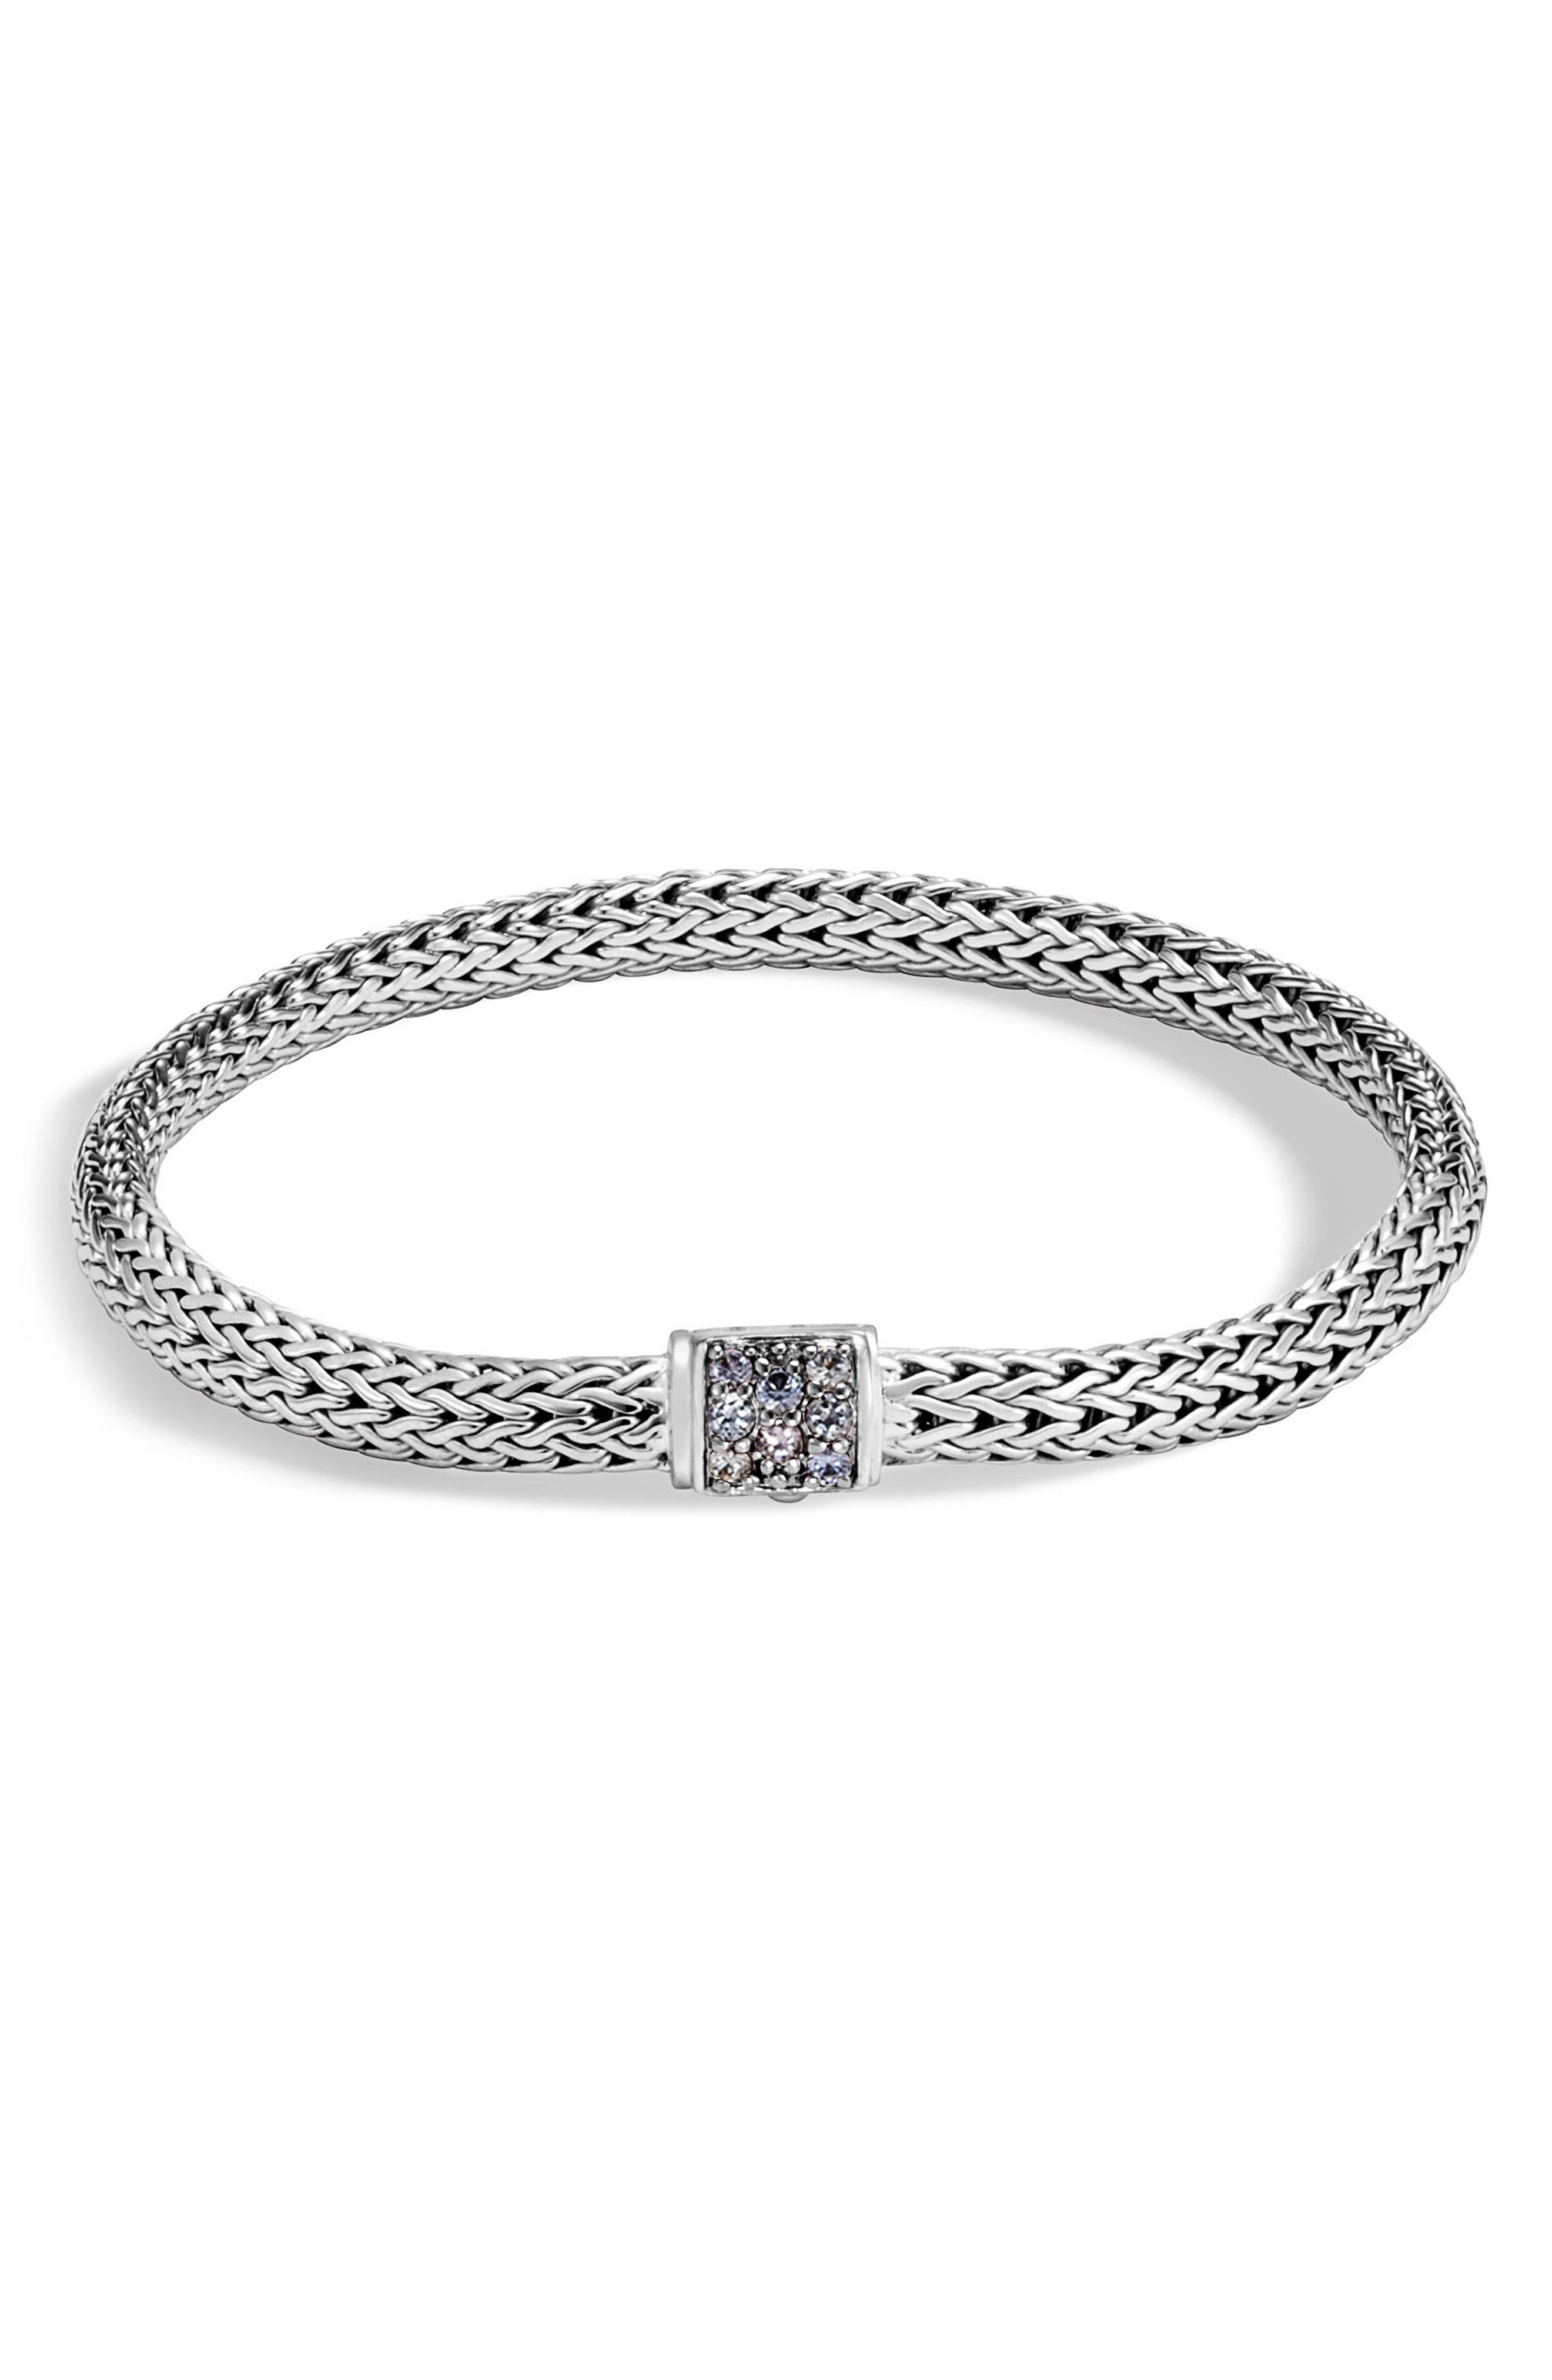 Alternate Image 1 Selected - John Hardy Classic Chain Extra Small Pavé Bracelet